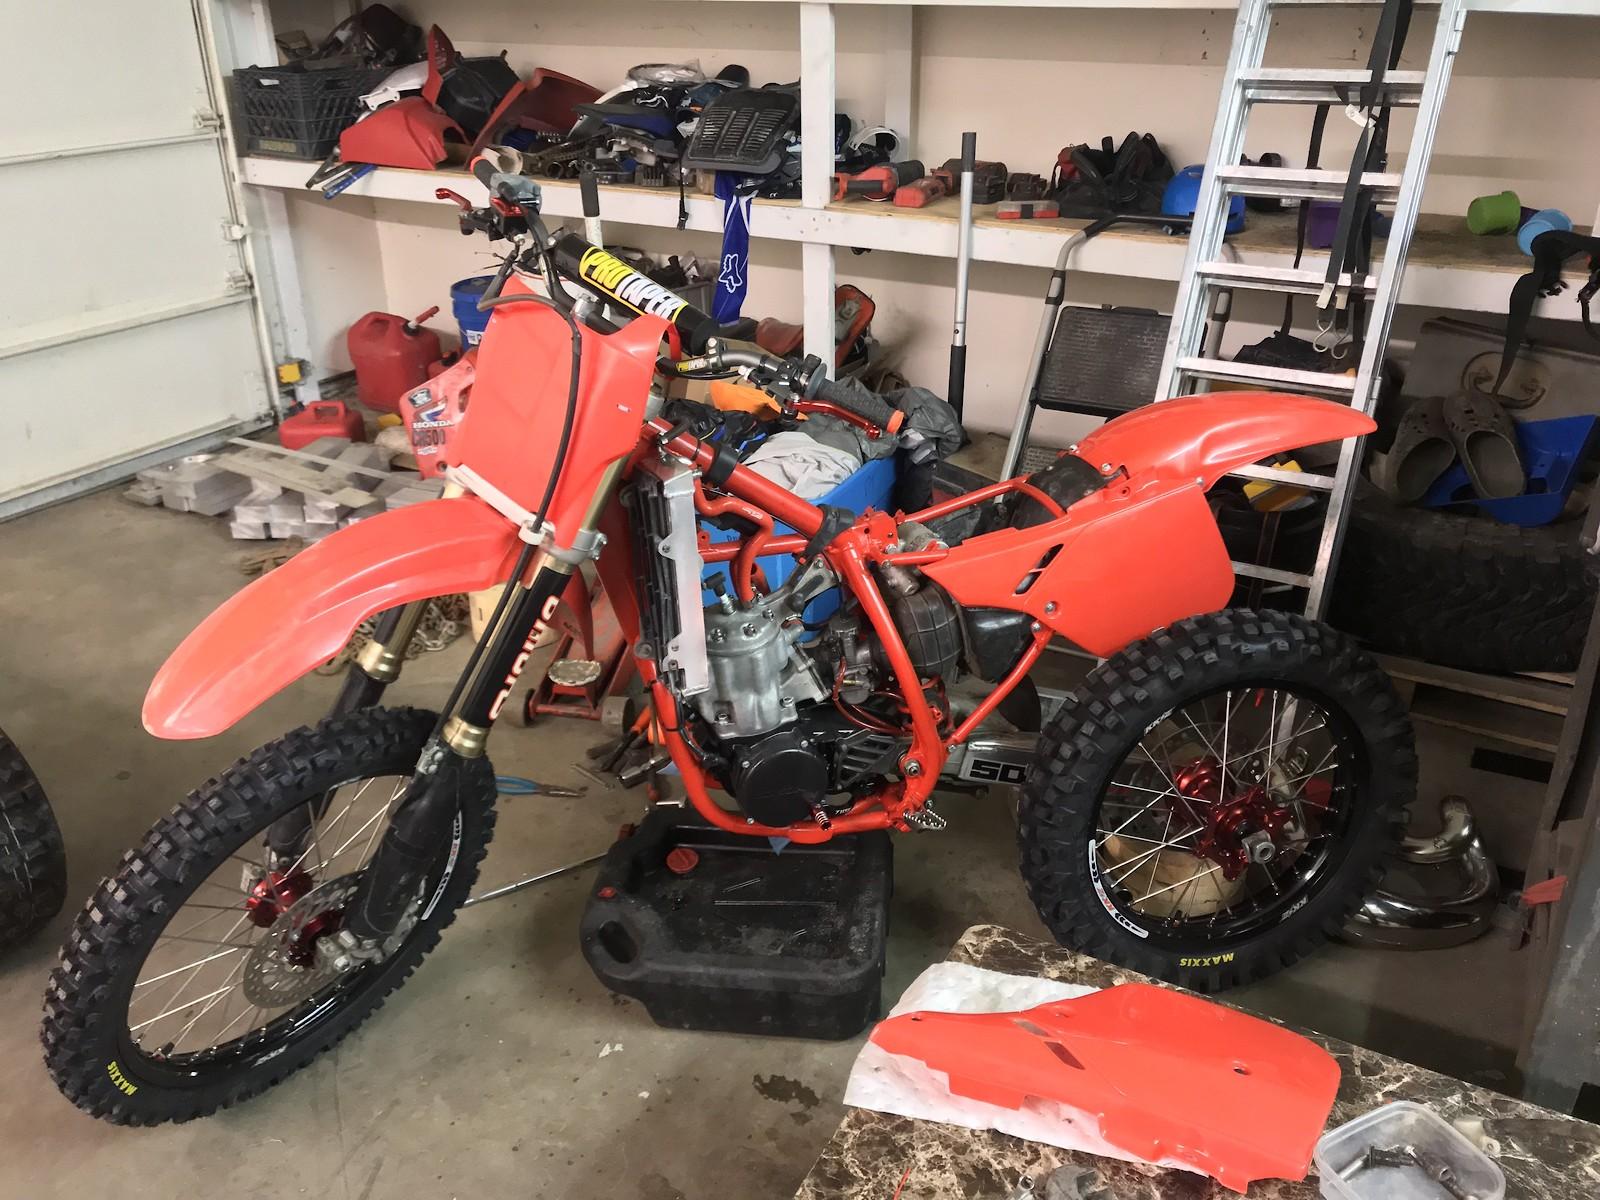 CF74D1EE-8427-4A96-B817-1EAD7B25F8FC - NateWeltzin - Motocross Pictures - Vital MX